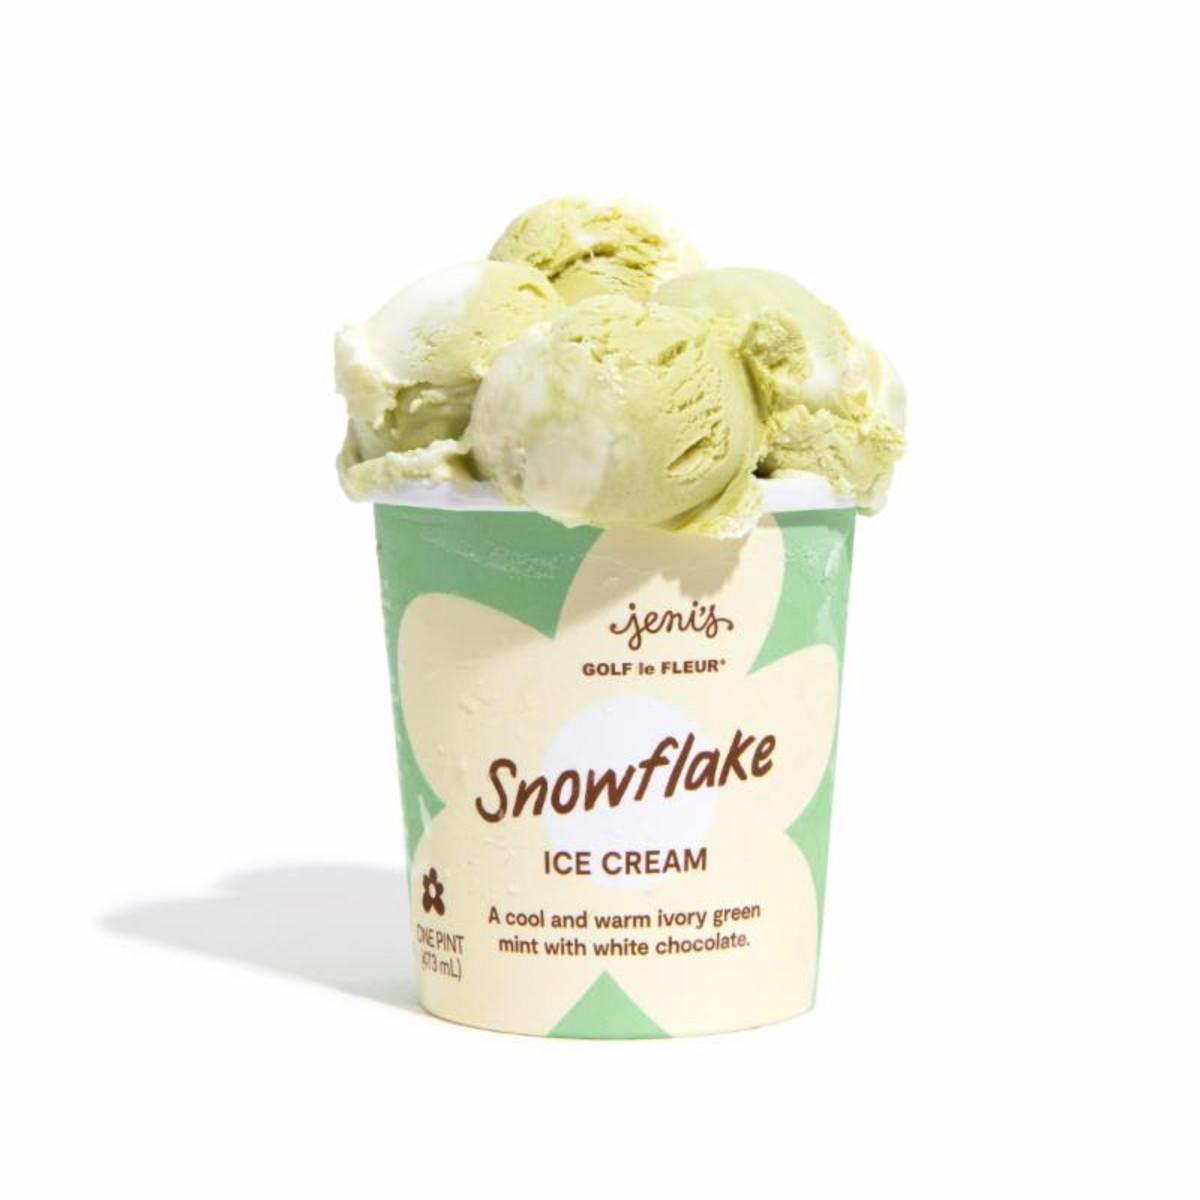 Tyler, The Creator Jeni's Ice Cream Snowflake